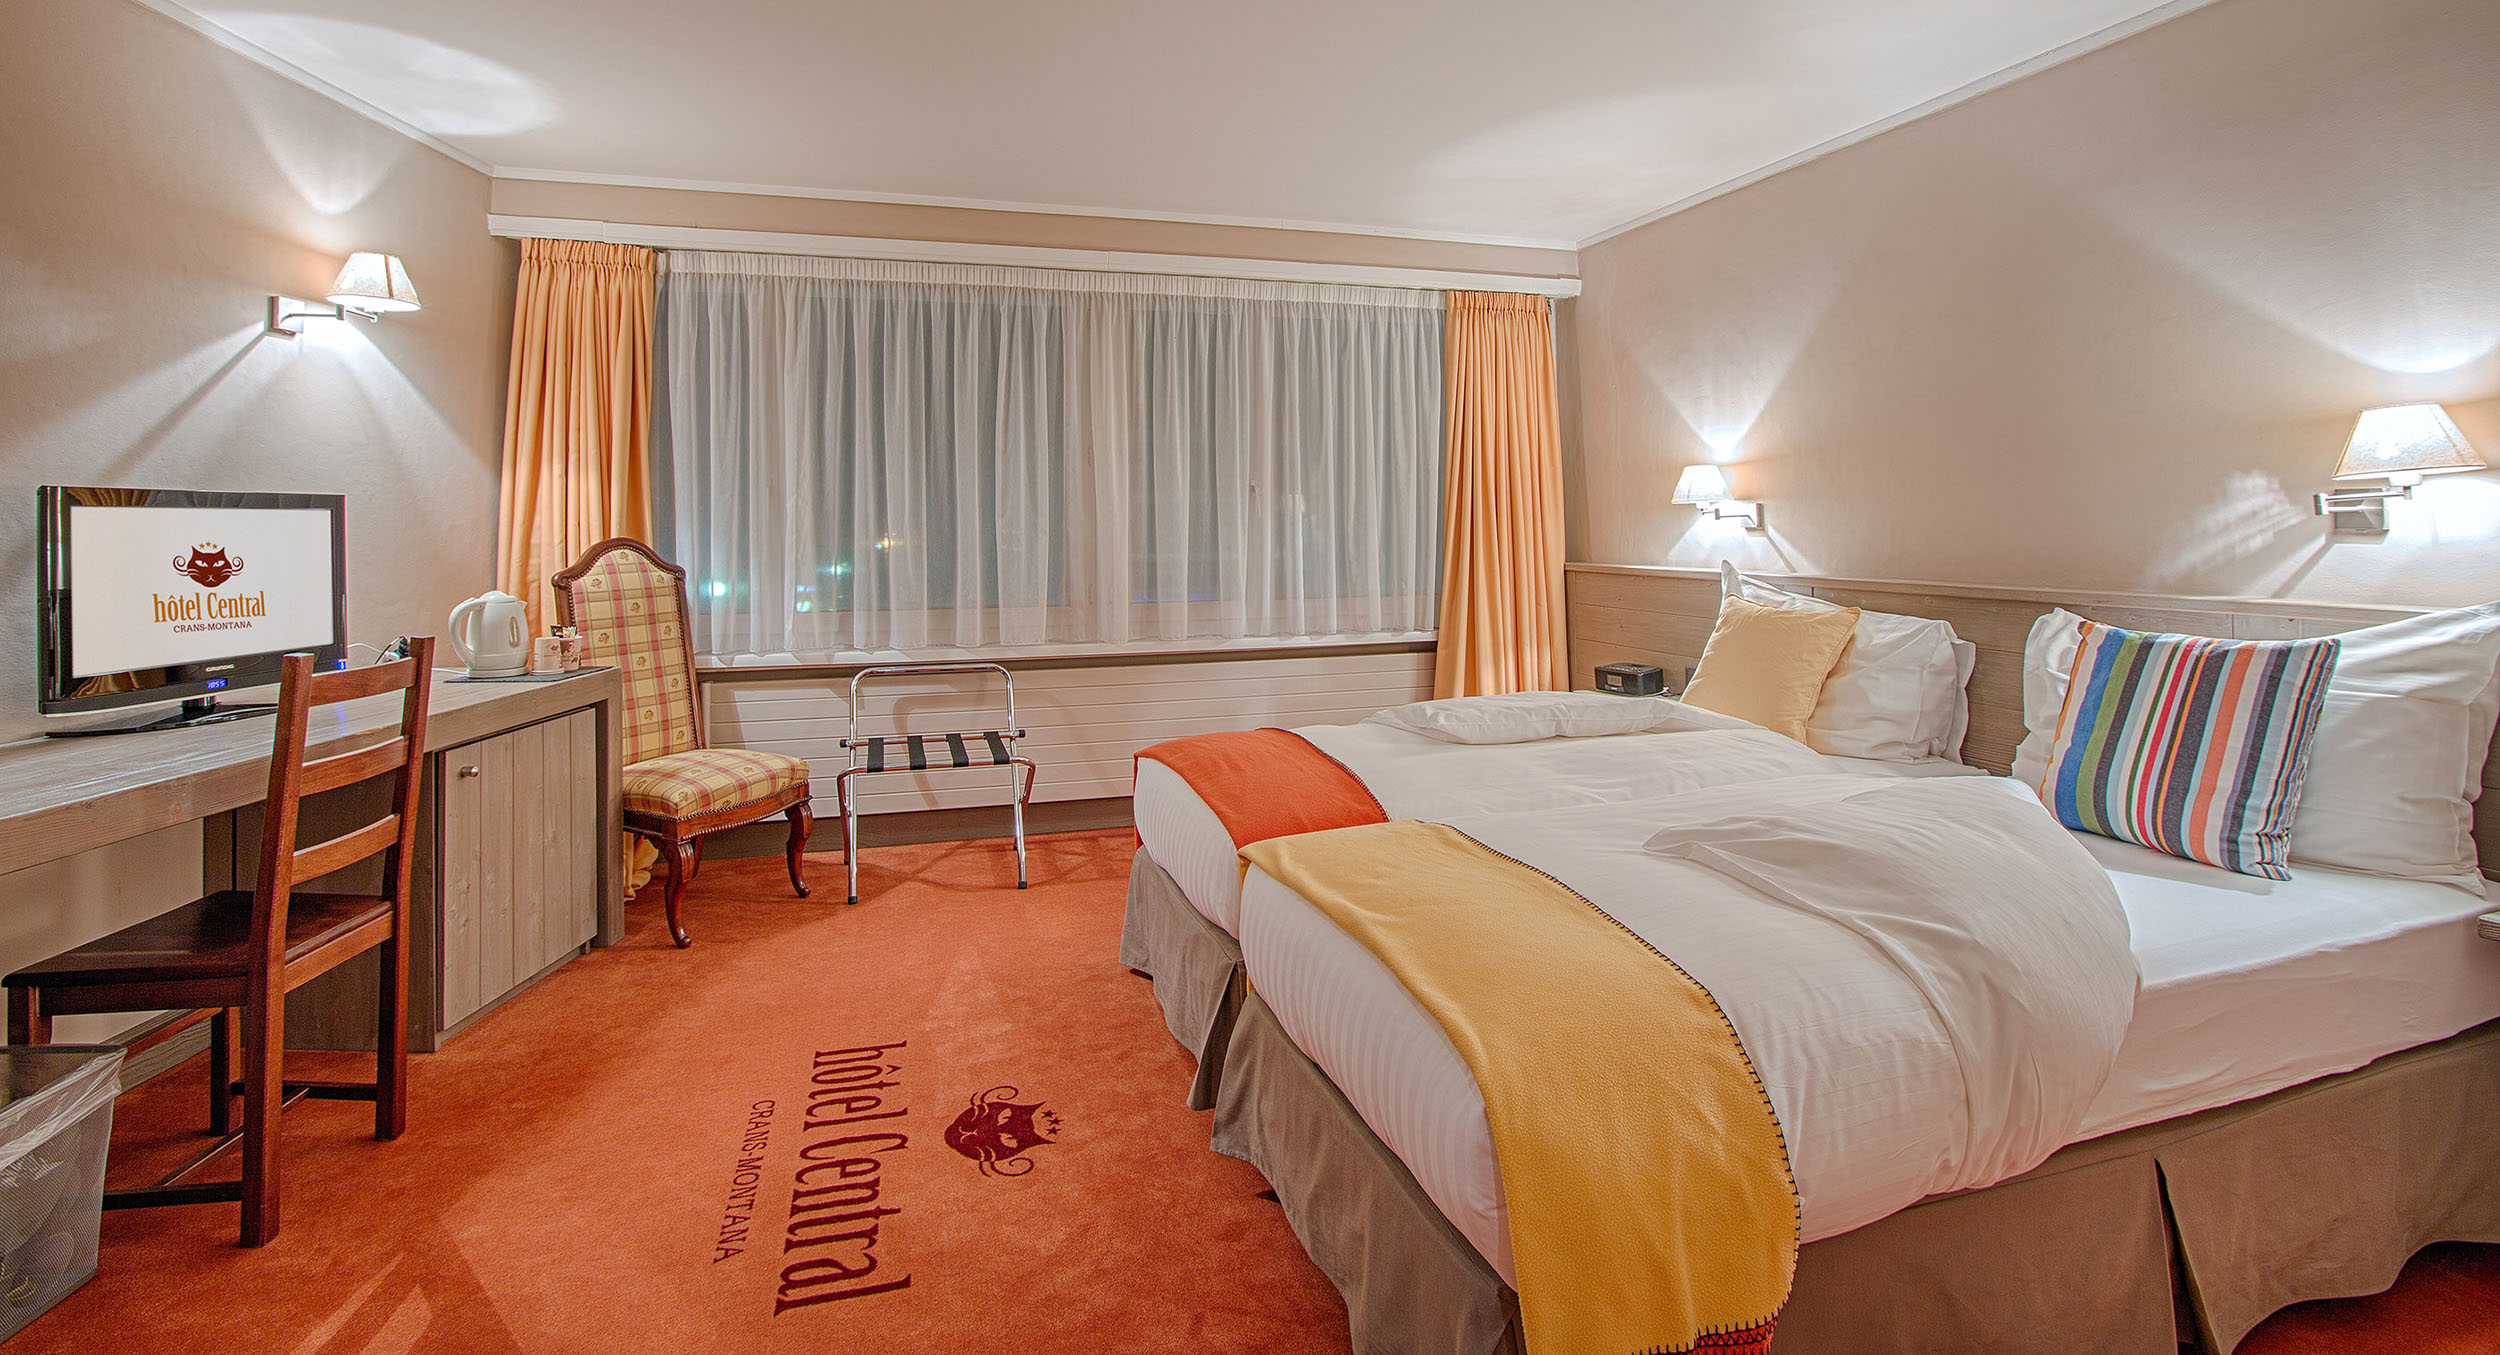 Hotel Central Crans Montana